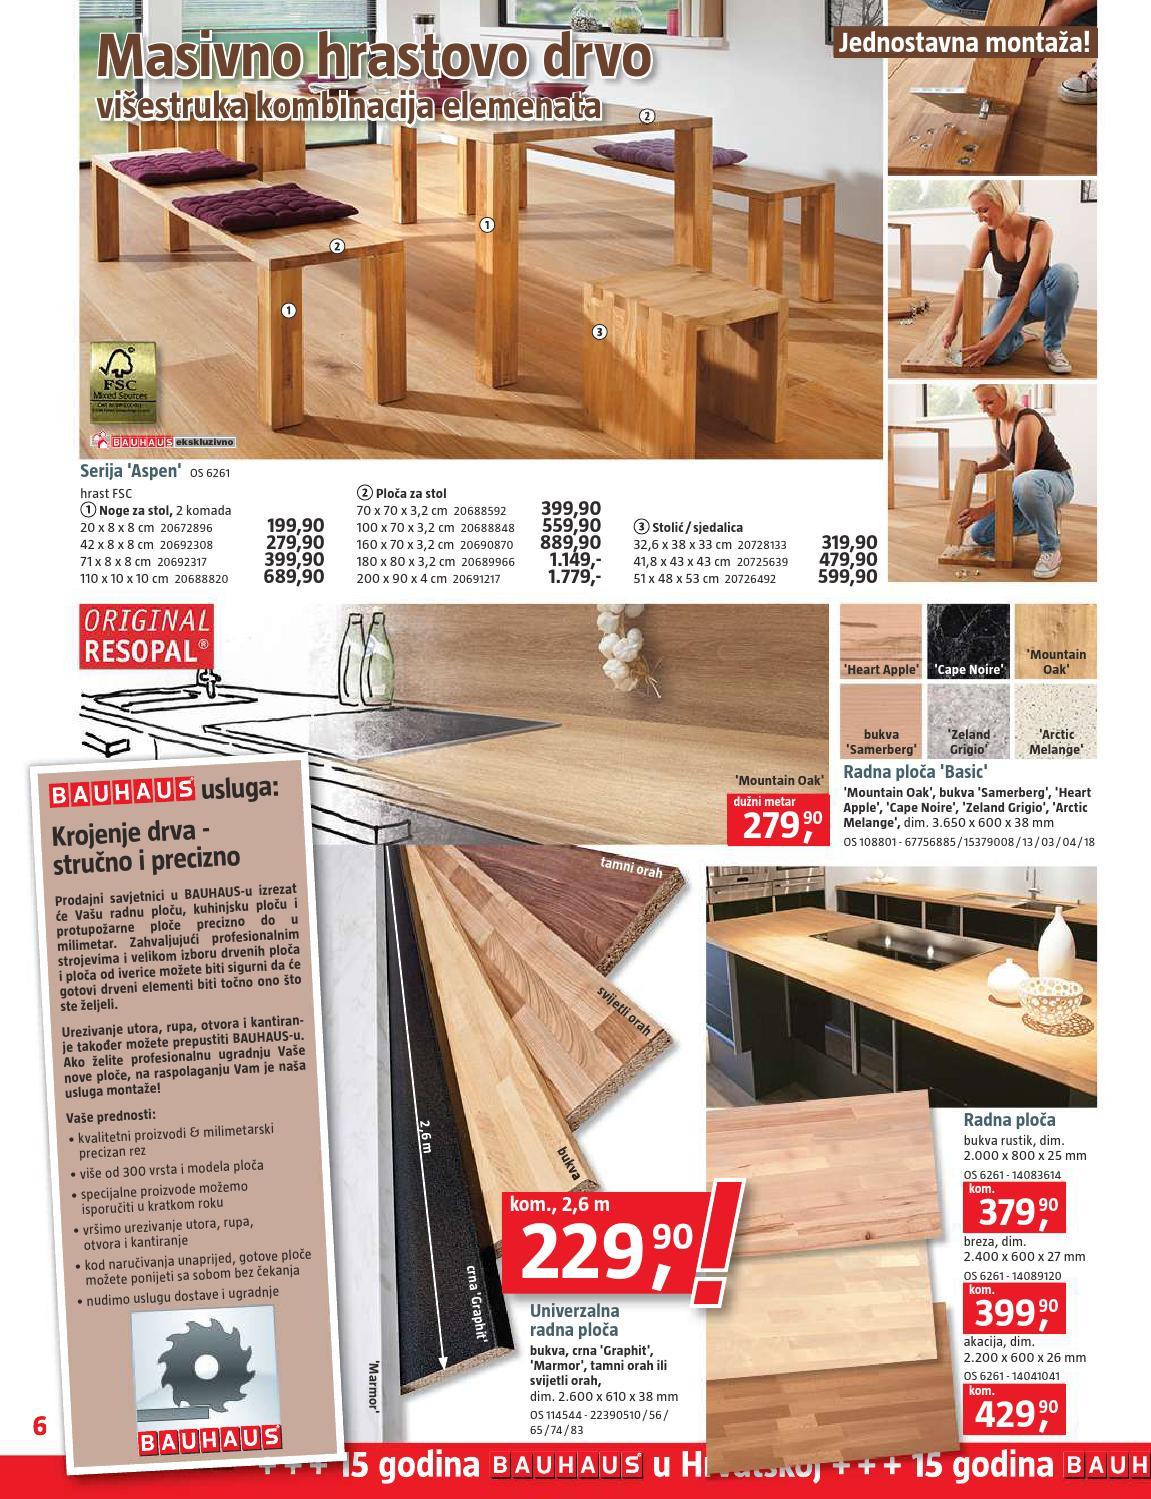 bauhaus katalog velja a 2015 by katalozi akcije popusti nagradne igre page 6. Black Bedroom Furniture Sets. Home Design Ideas